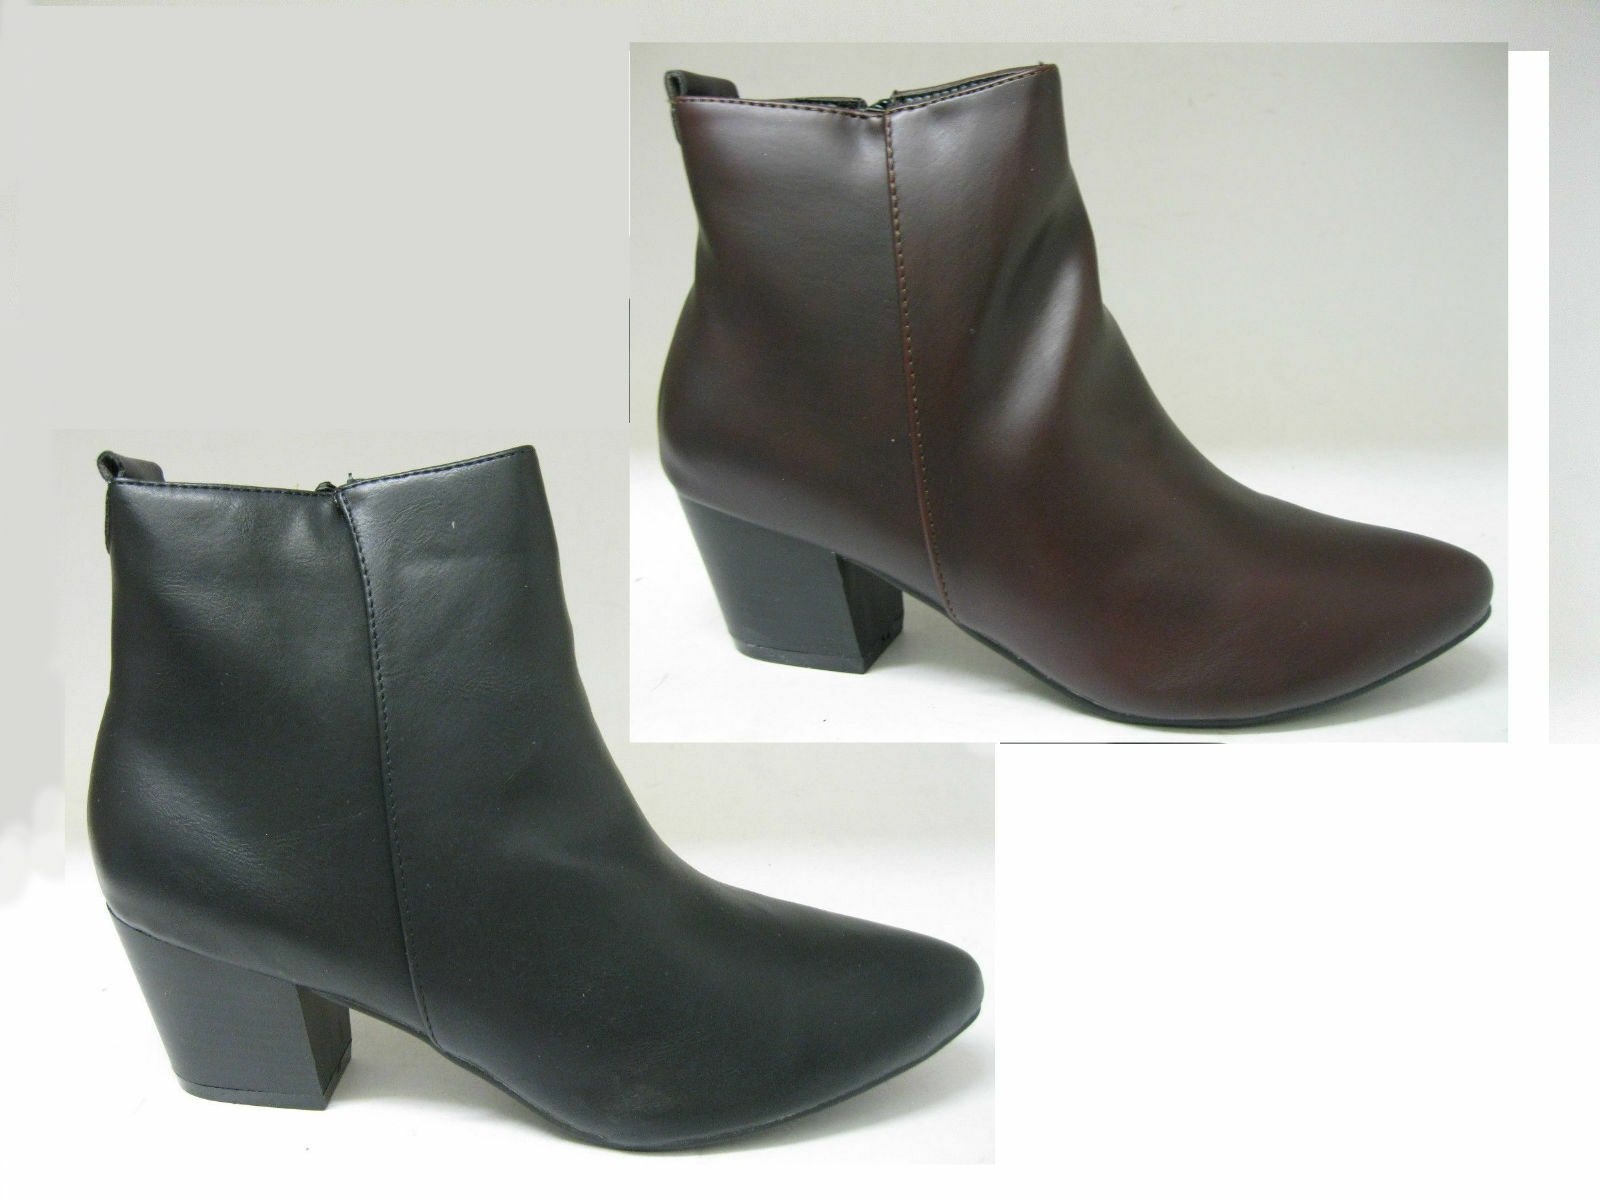 SPOT ON F50360 Ladies Block Heel Ankle Boot with Zip